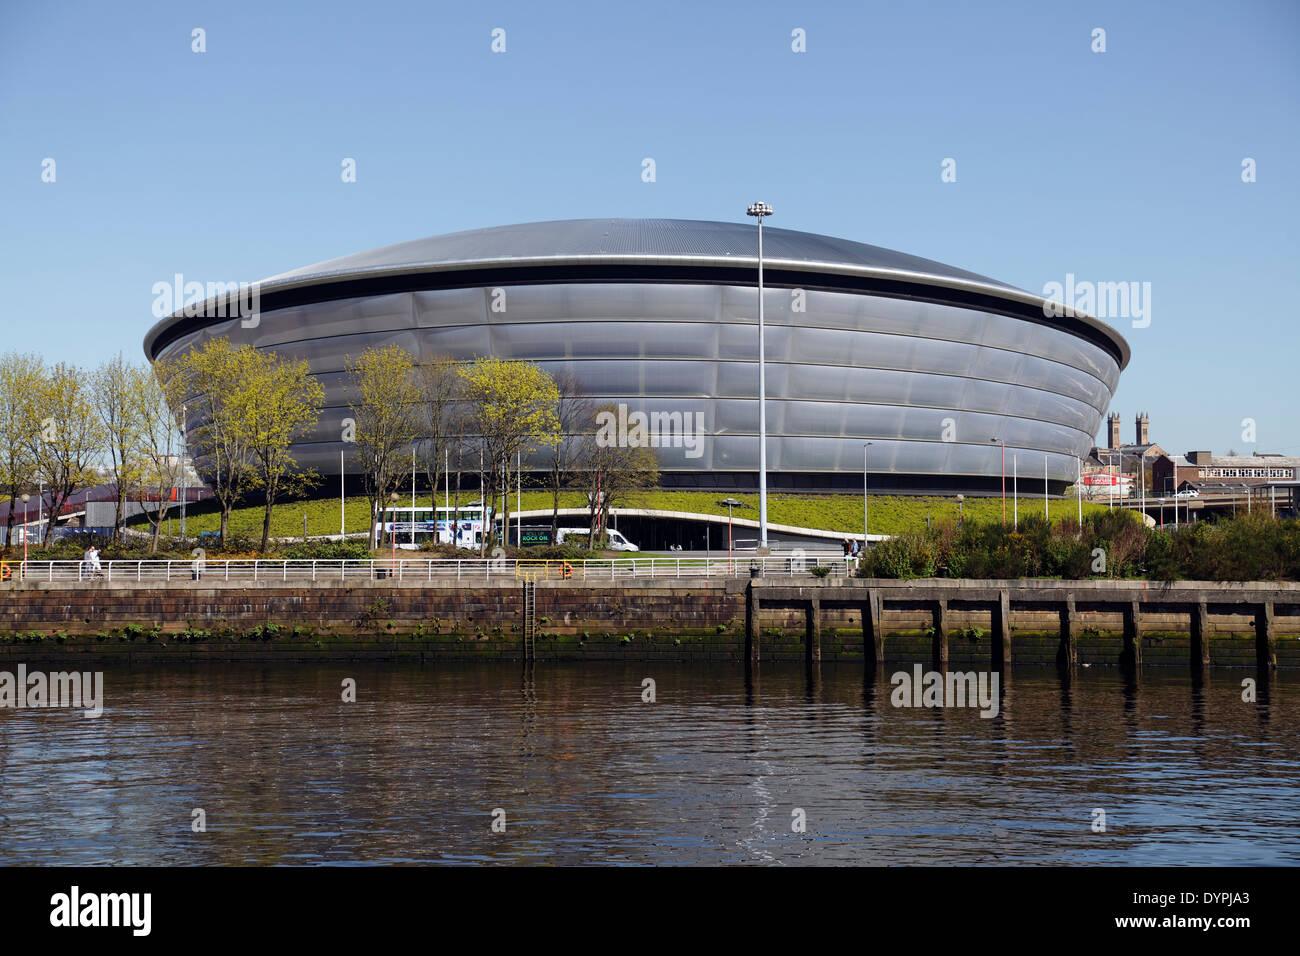 The SSE Hydro Arena in Glasgow, Scotland, UK - Stock Image